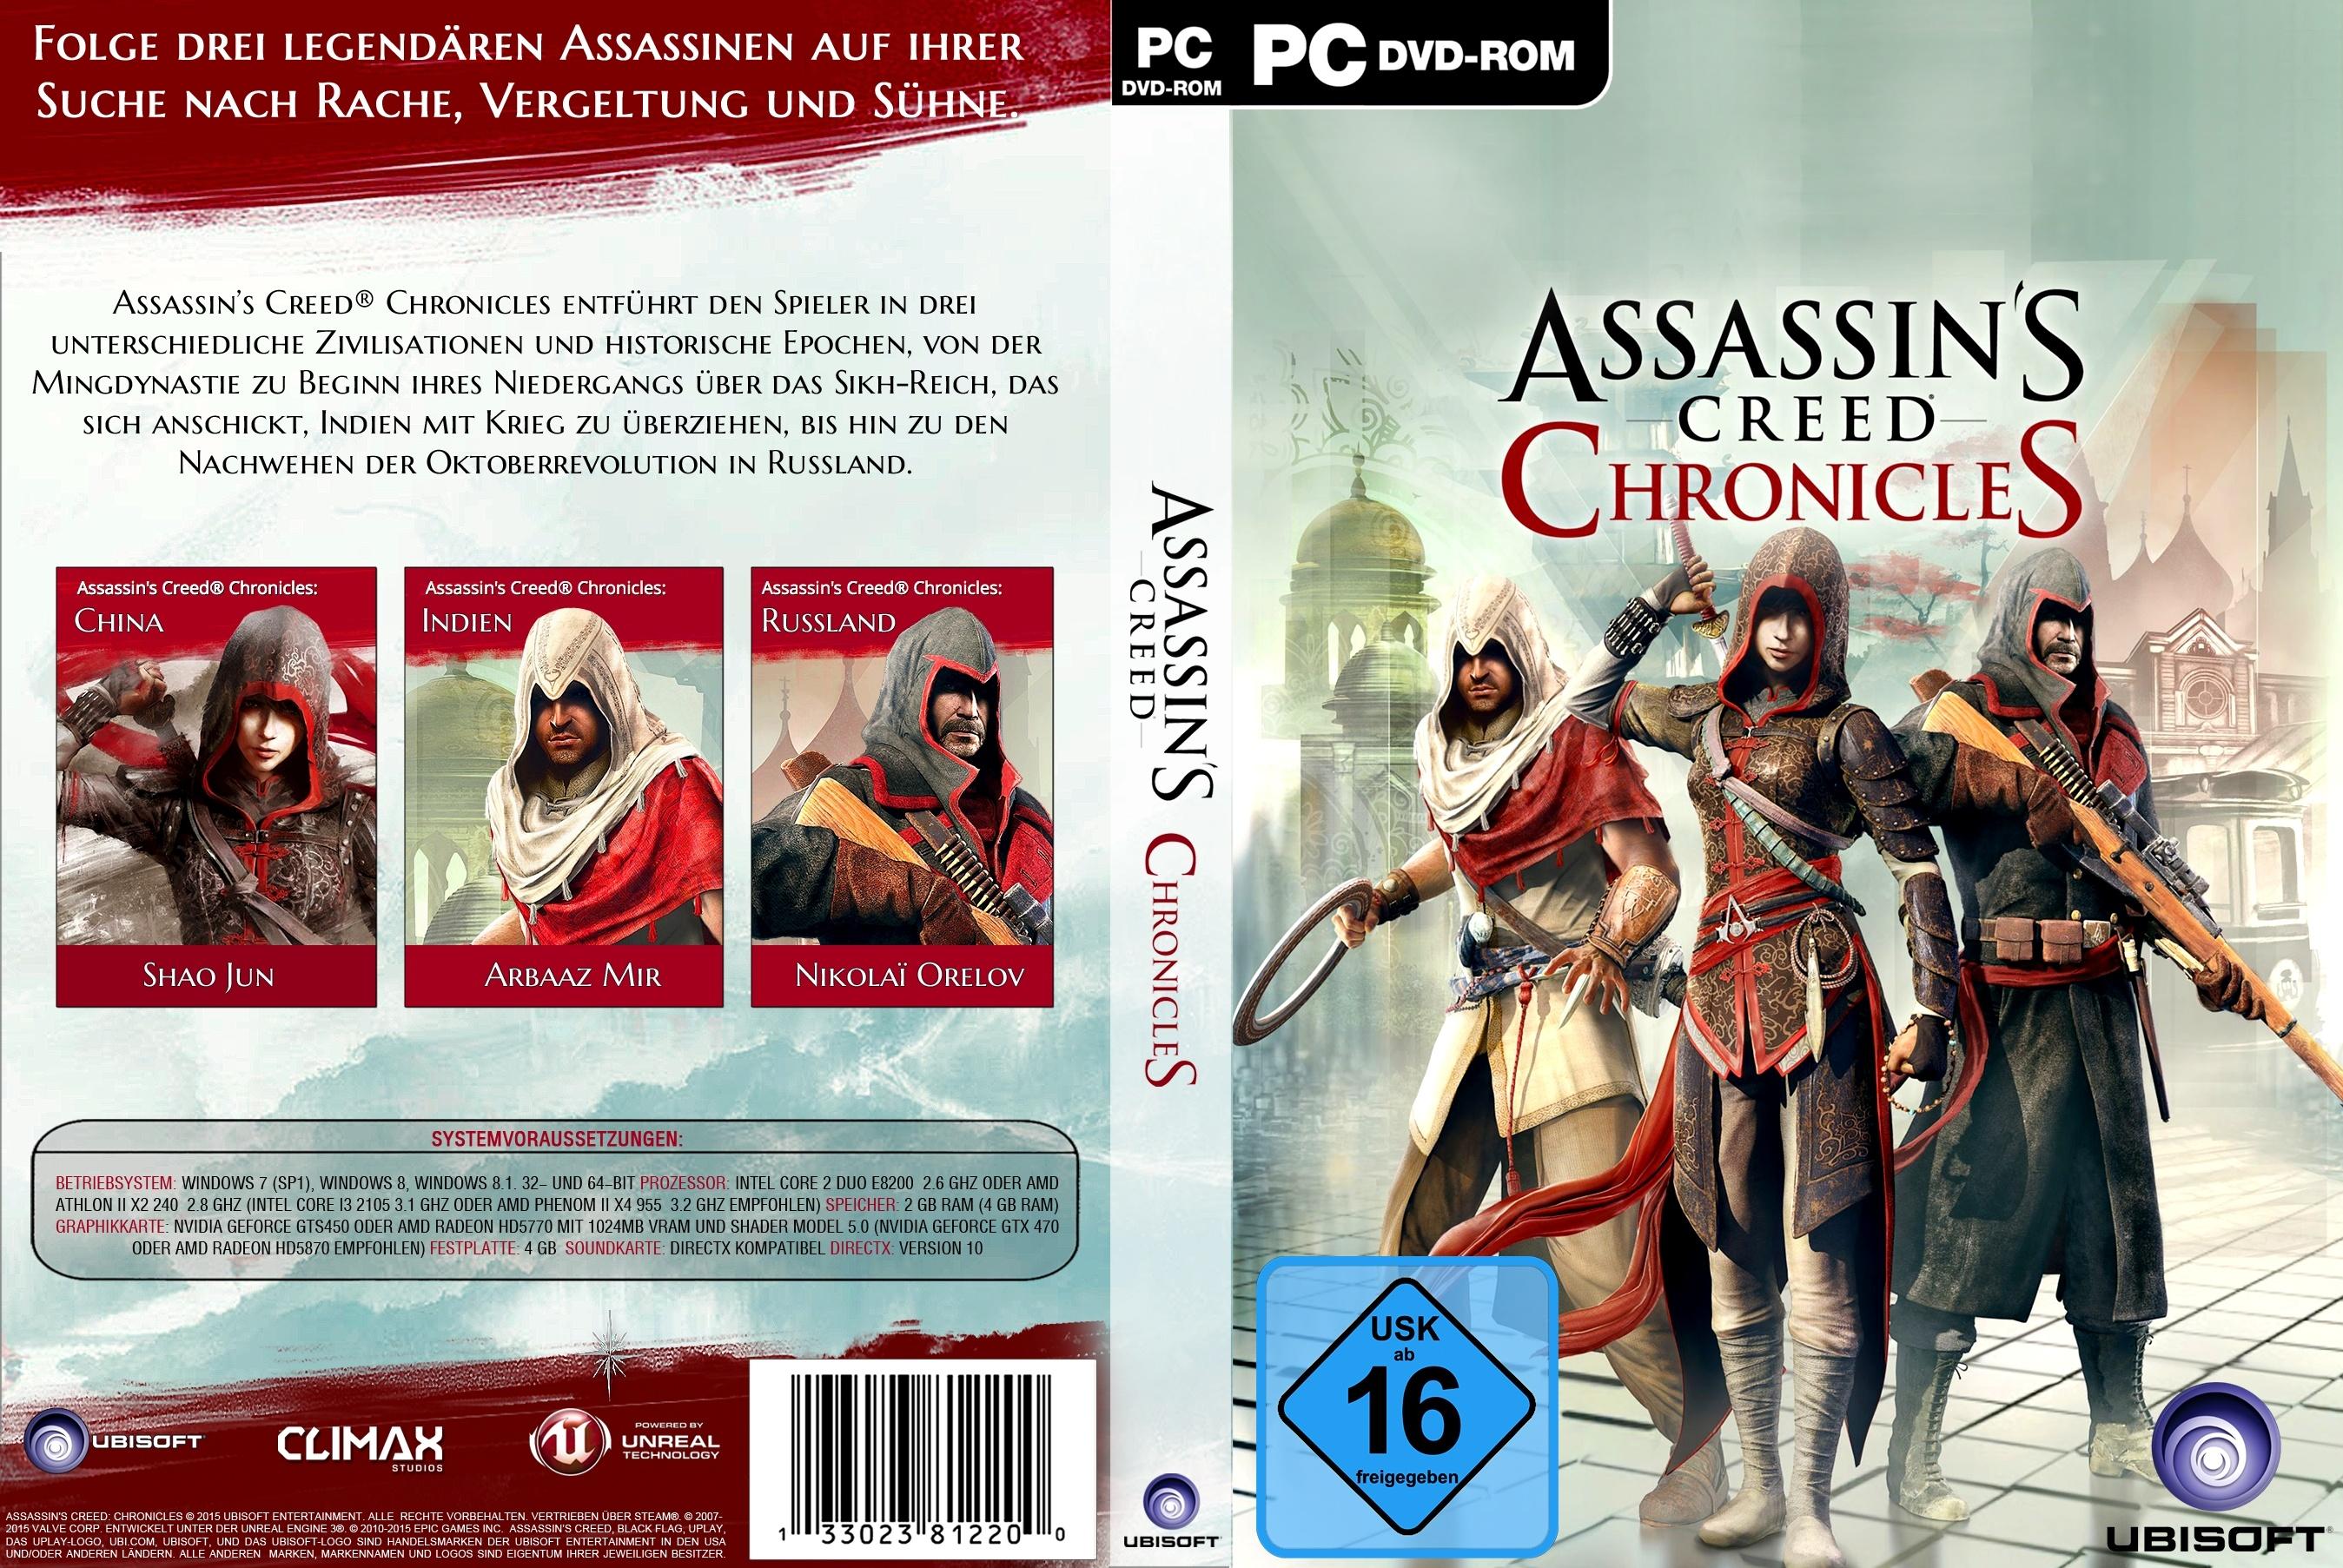 Assassin's creed hentaiassassin's creed hentaiassassin's creed hentaiassassin's  sex image